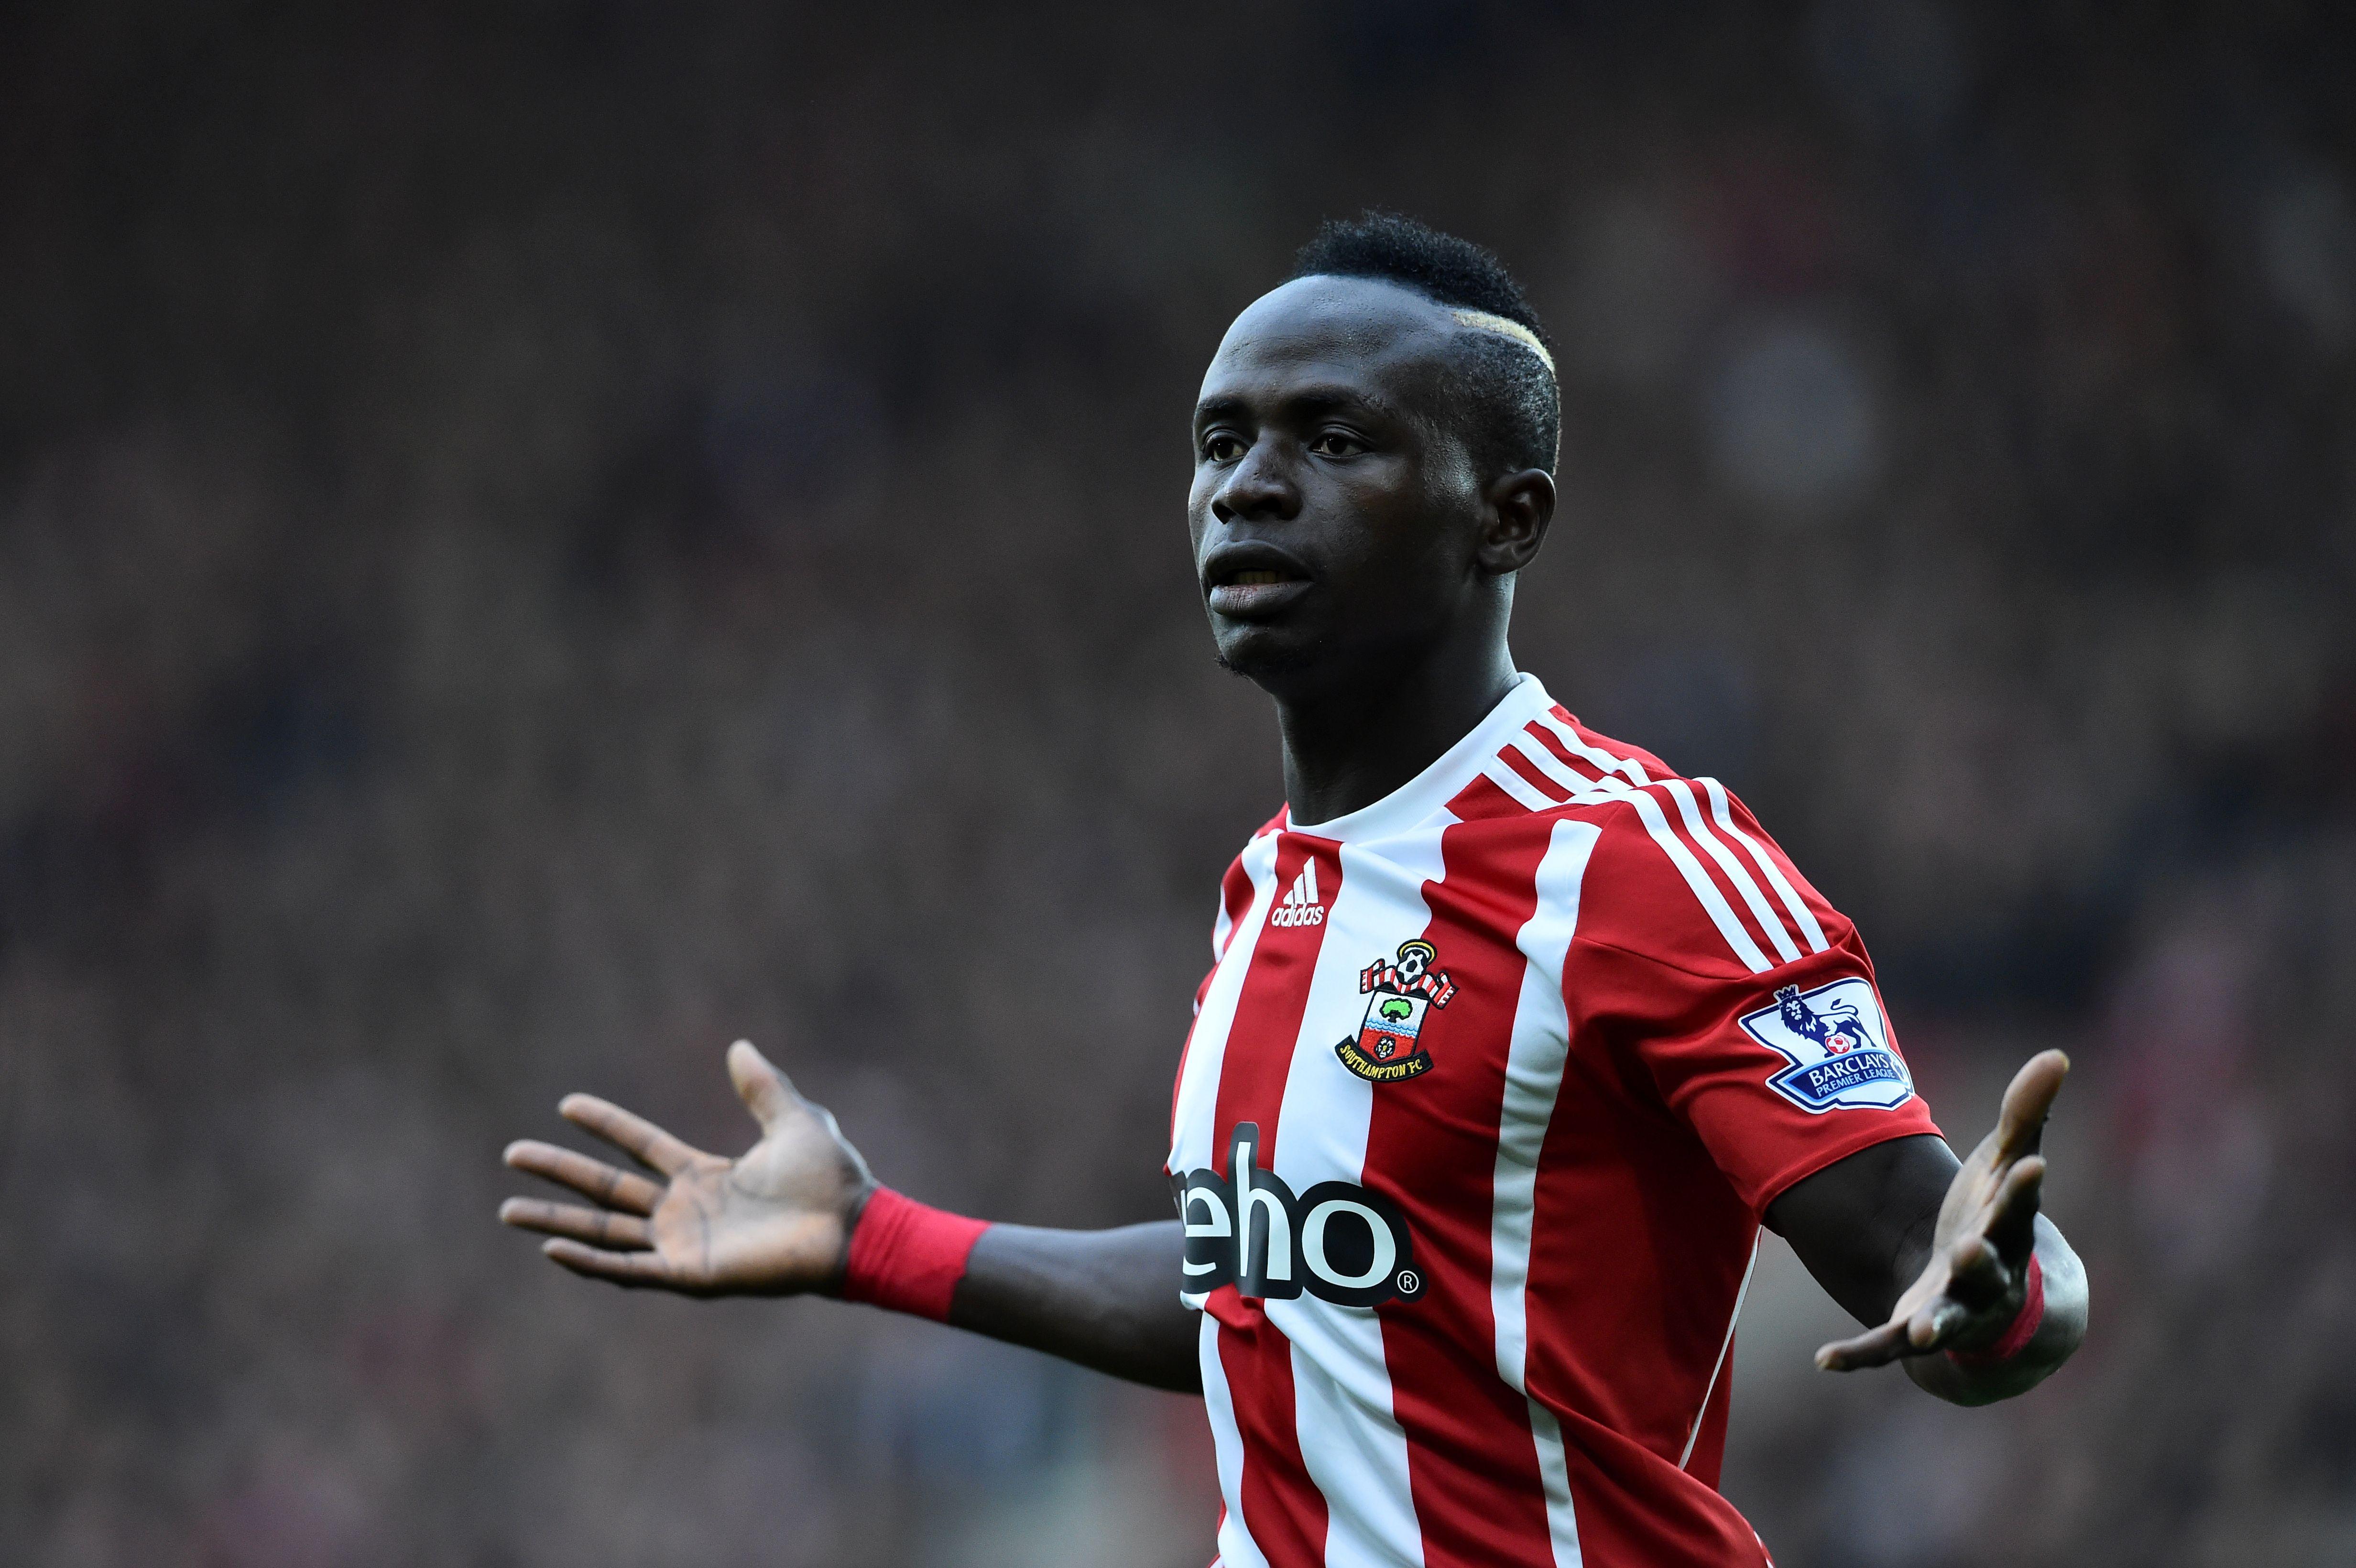 Will Liverpool really make a £25million transfer bid for Southampton's Sadio Mane?